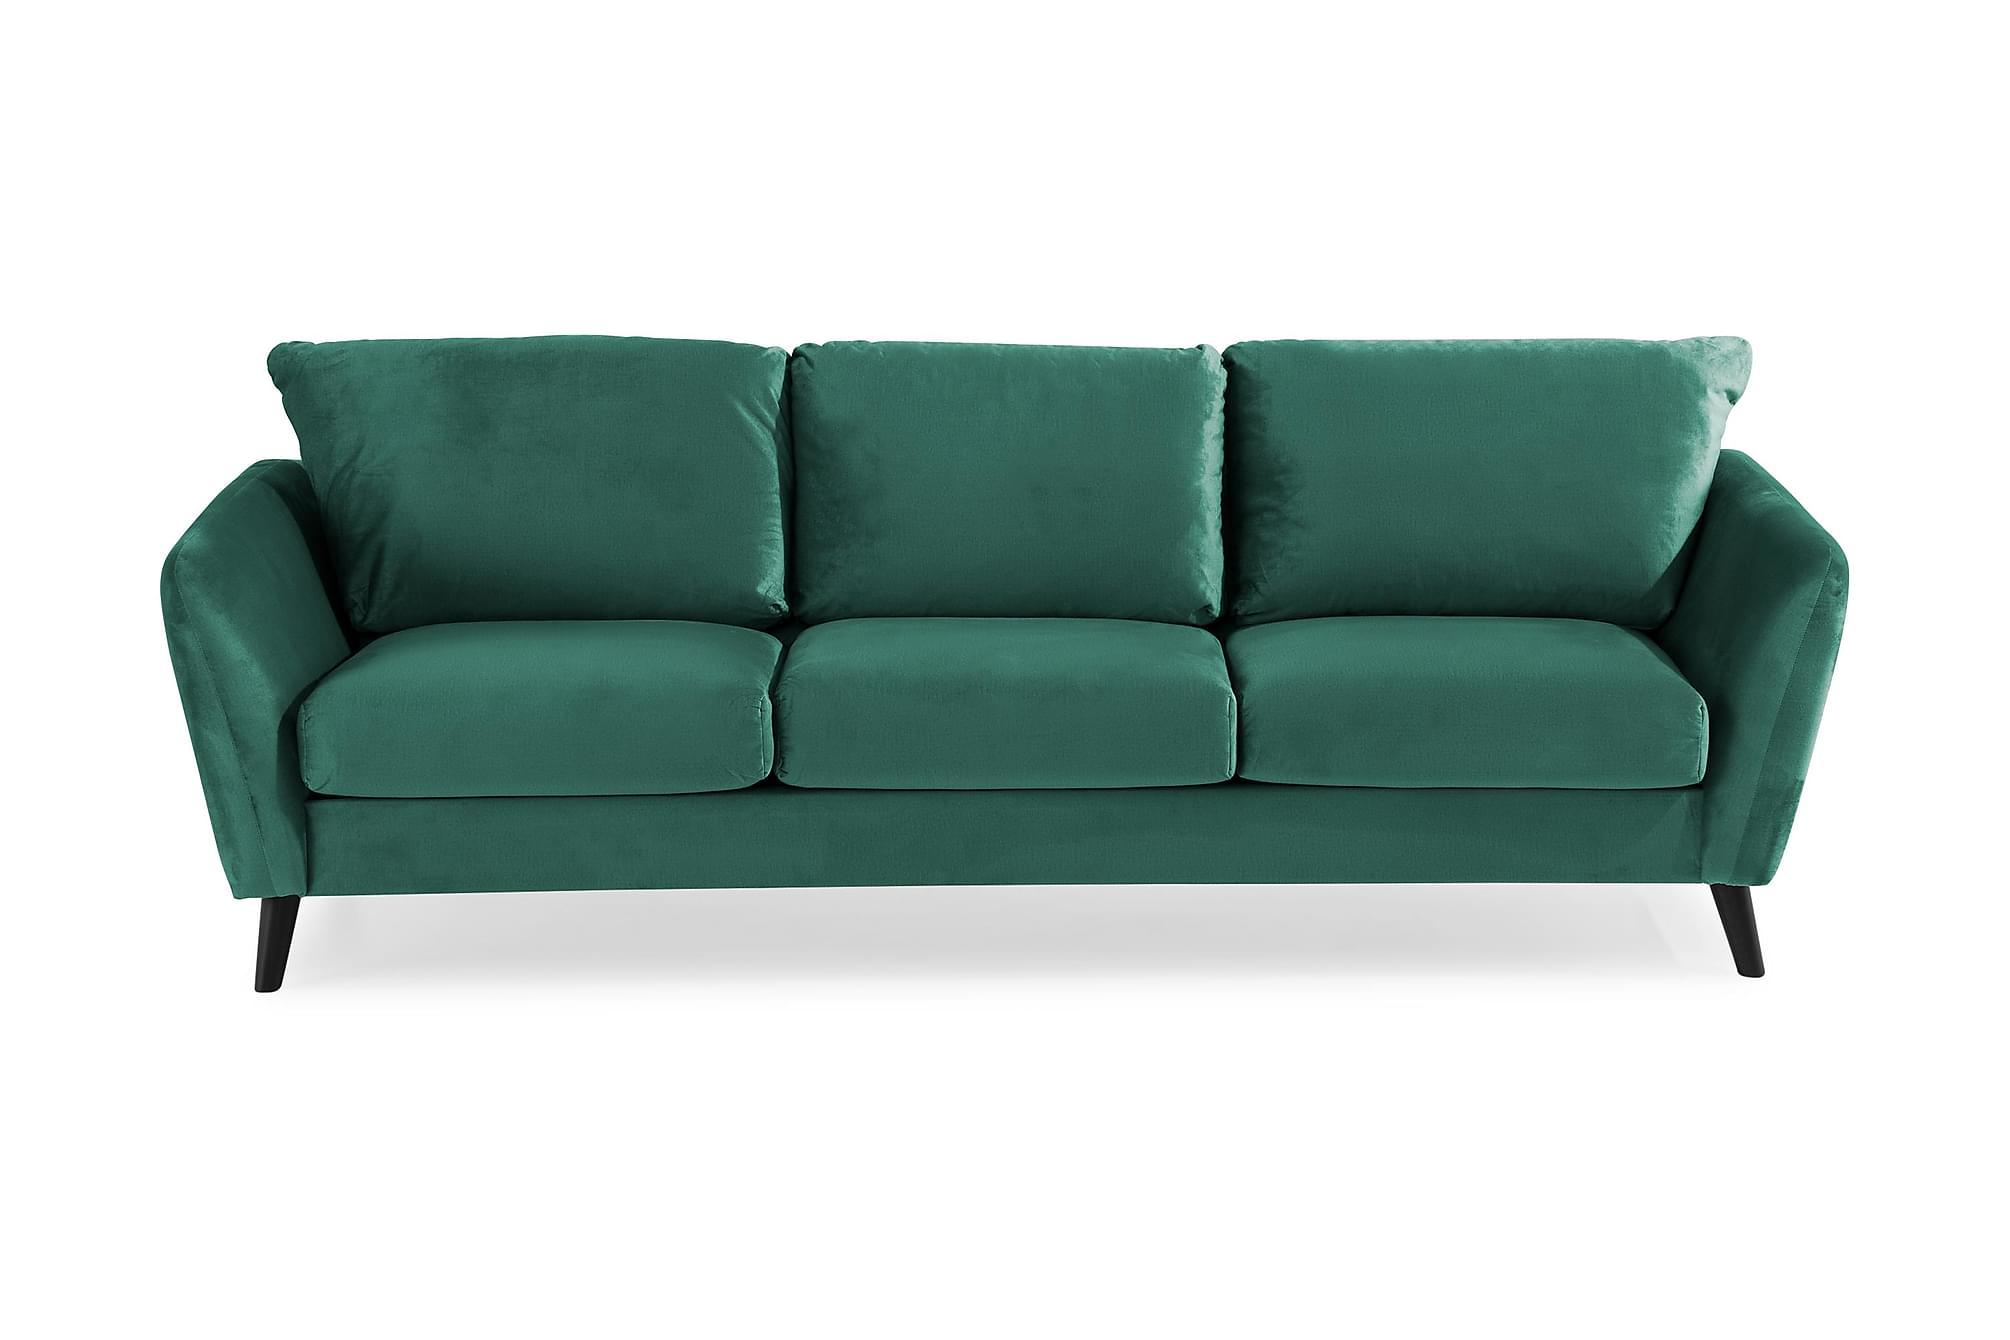 OSCAR Sammetssoffa 3-sits Grön